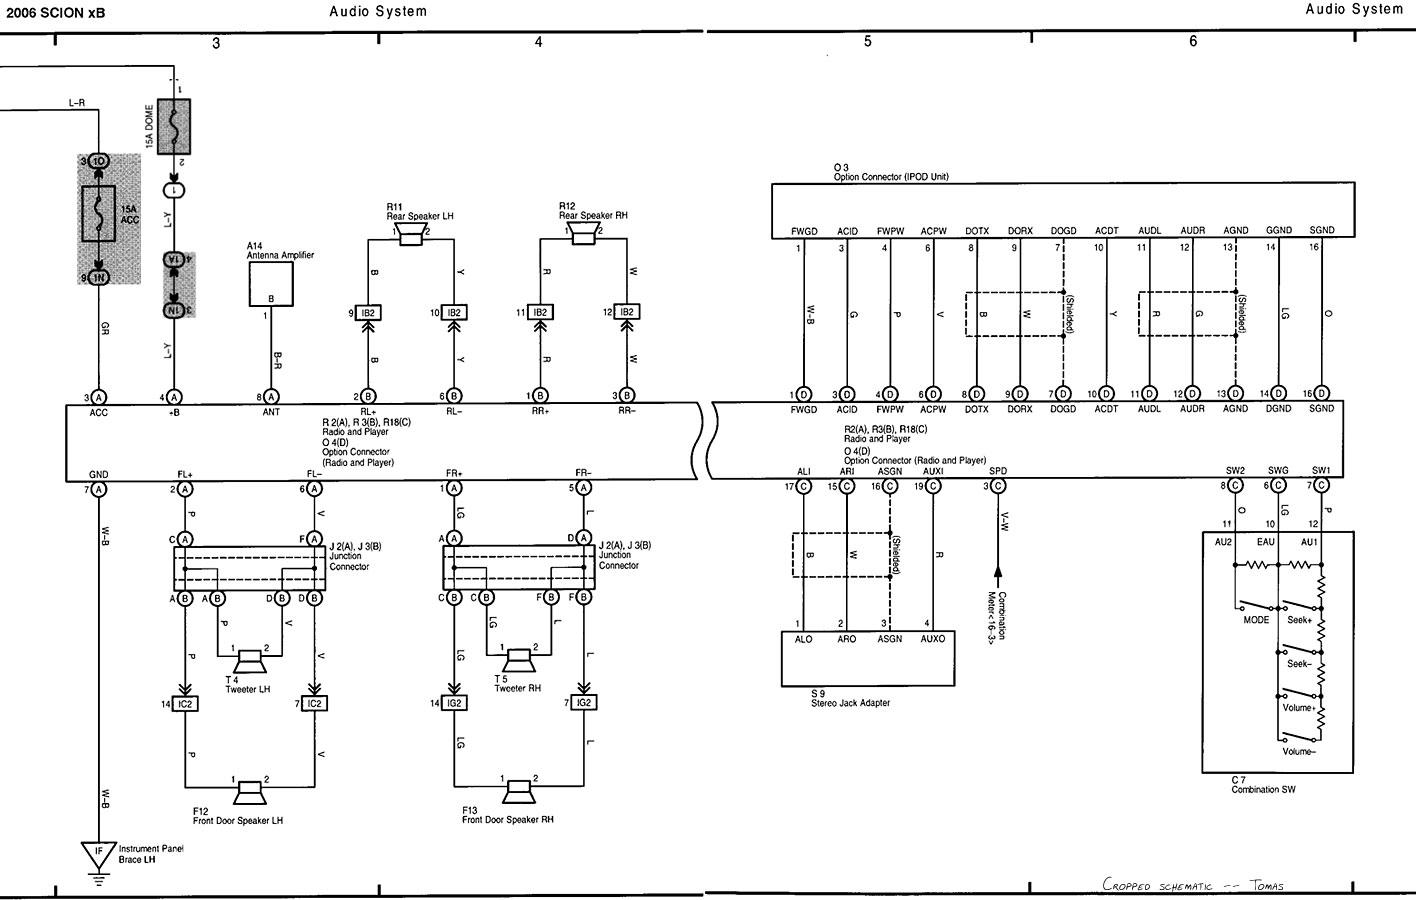 Wiring Diagram 2006 Scion Tc - Wiring Diagram For 2000 Chevy Blazer for Wiring  Diagram SchematicsWiring Diagram Schematics